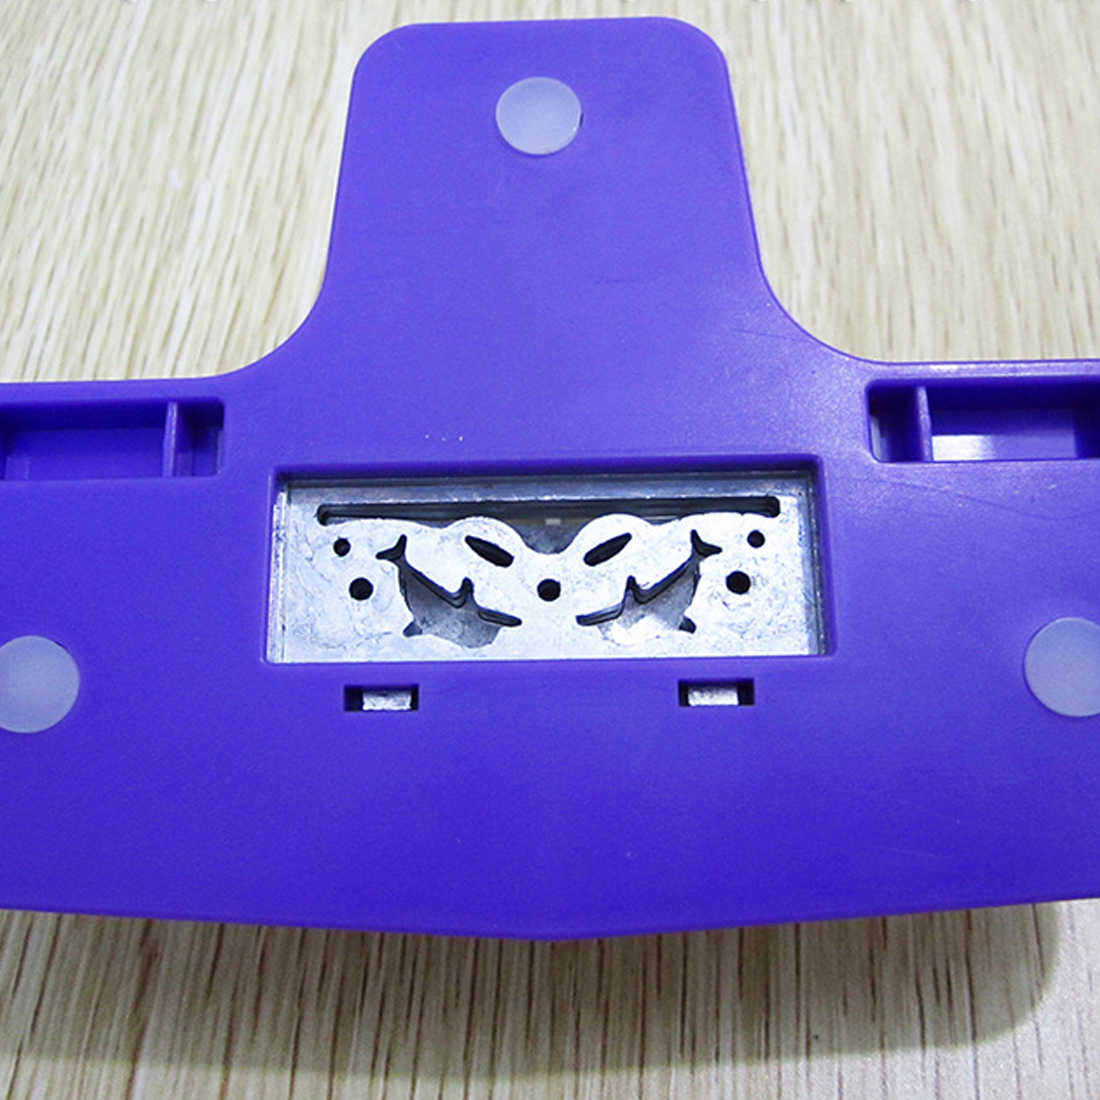 Punch scrapbooking handmade EDGE อุปกรณ์ DIY เครื่องตัดกระดาษ CRAFT Handmade ใหม่แฟนซีชายแดน Punch S ดอกไม้ลายนูน